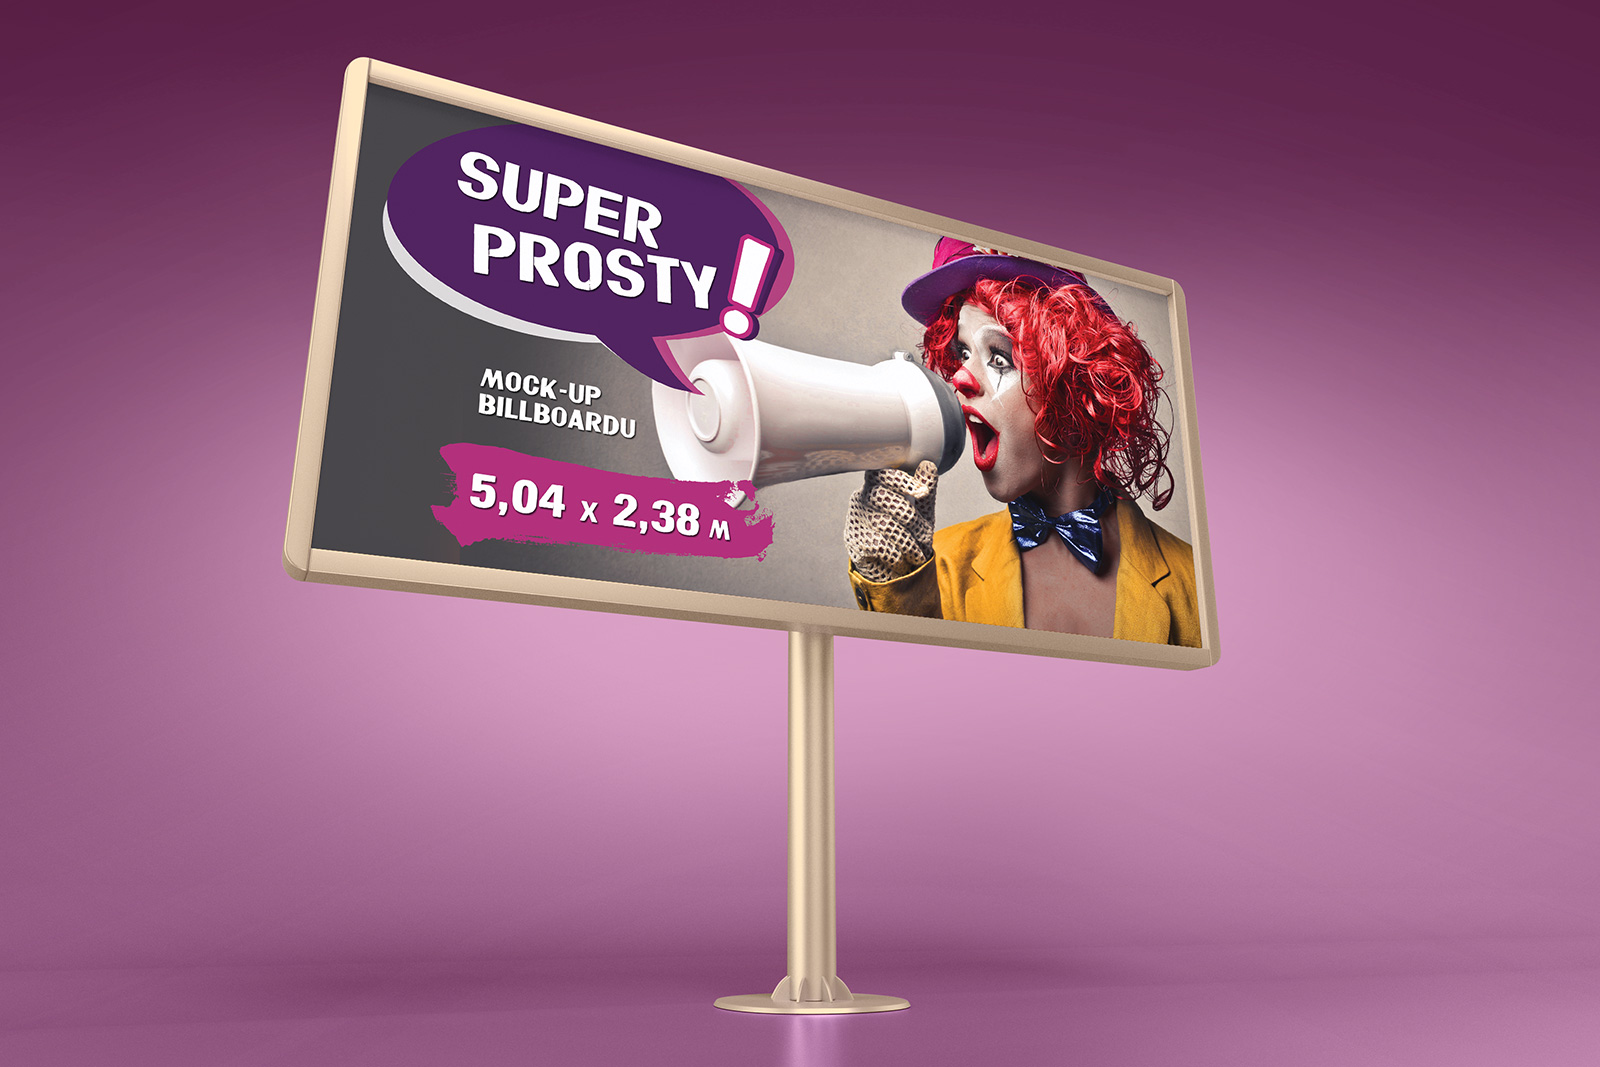 Free-Outdoor-Advertising-Billboard-Mockup-PSD-File-2